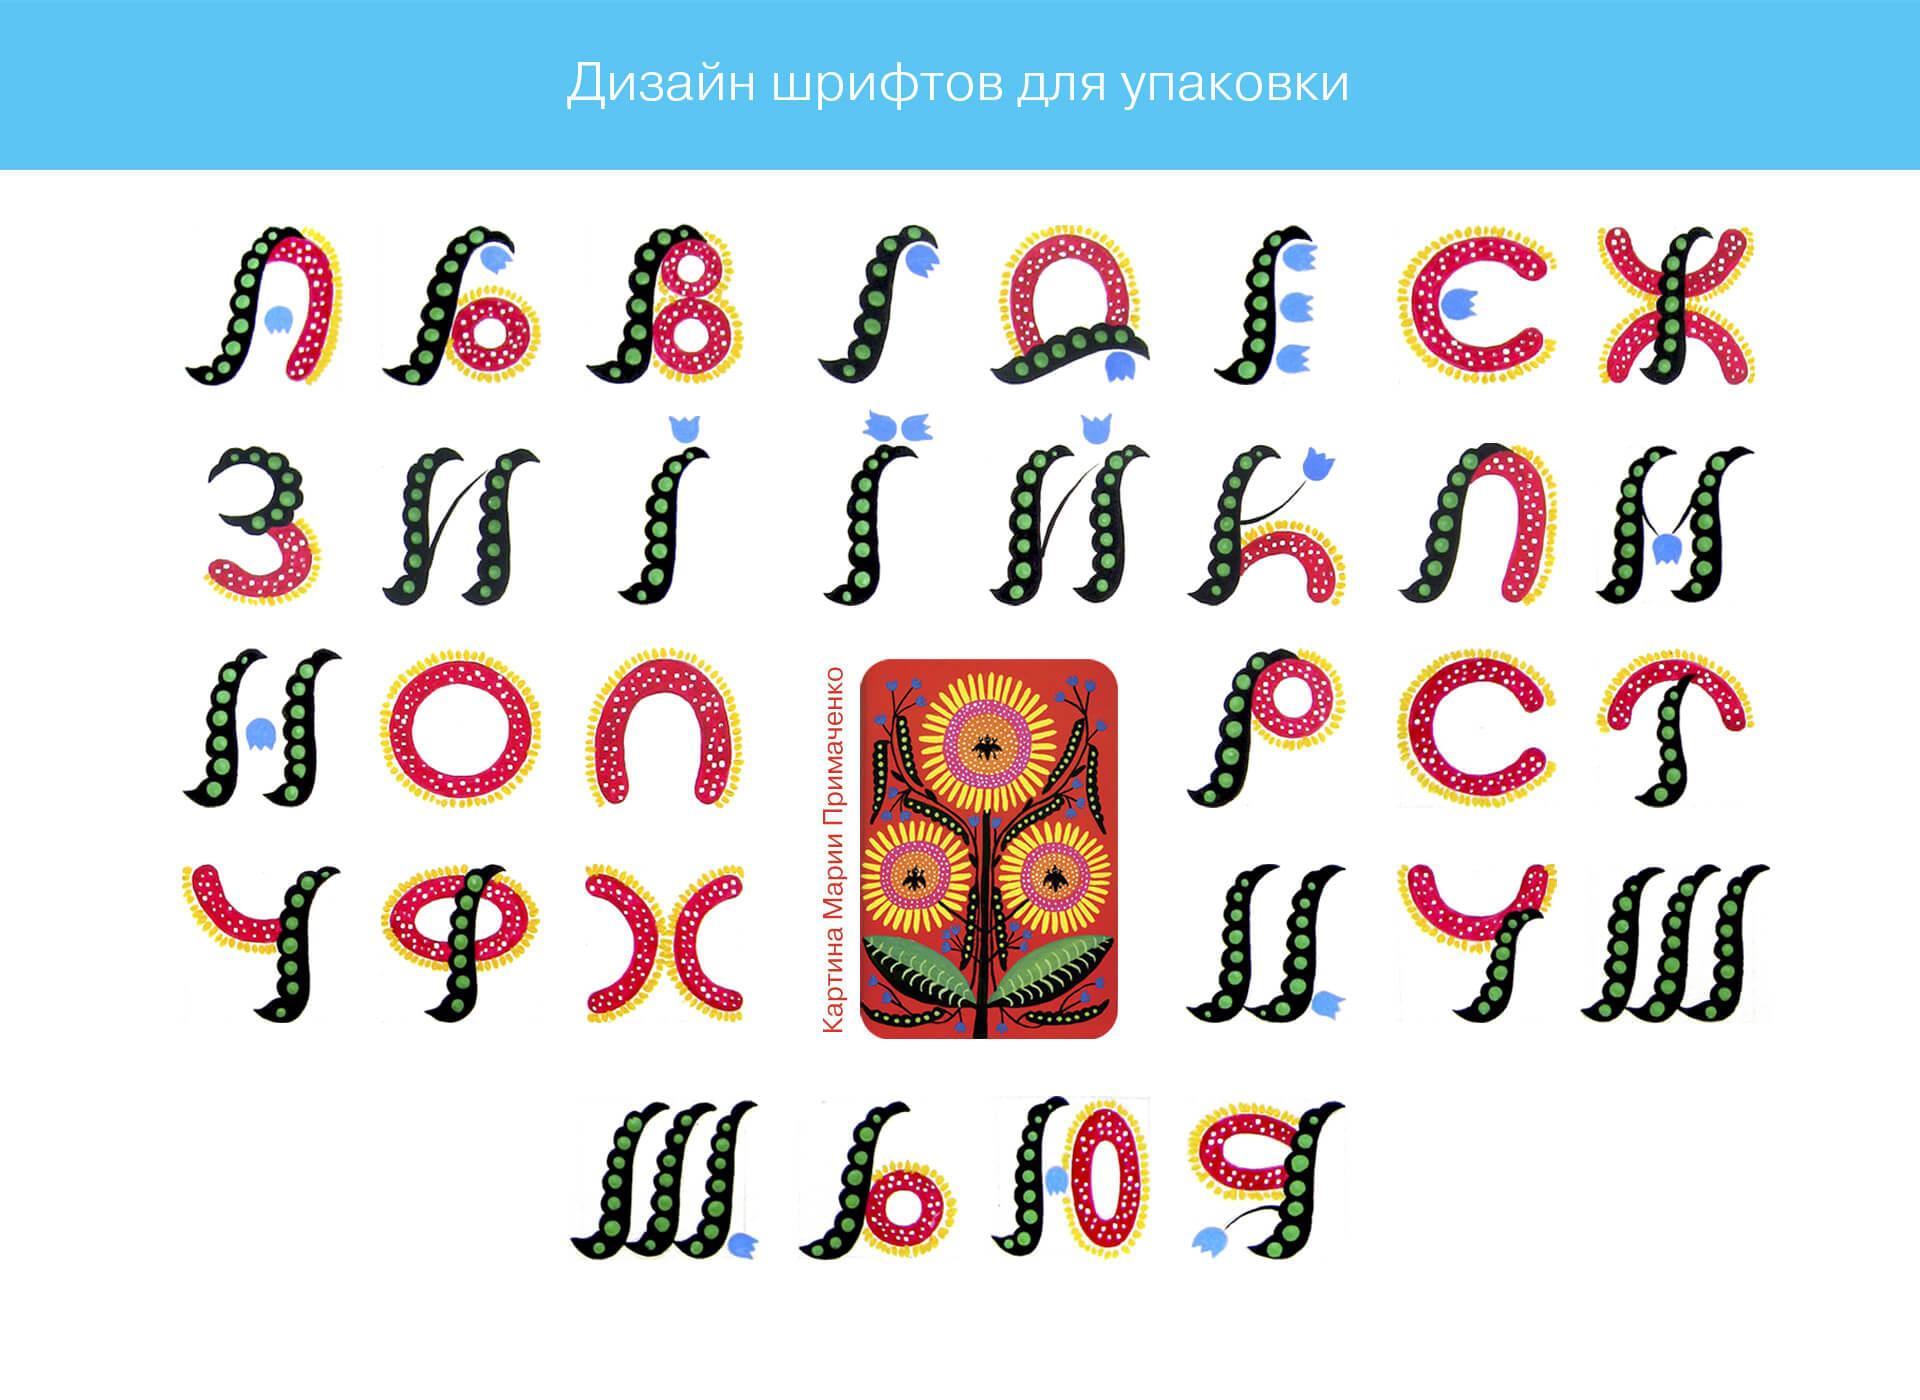 prokochuk_irina_font-design_5